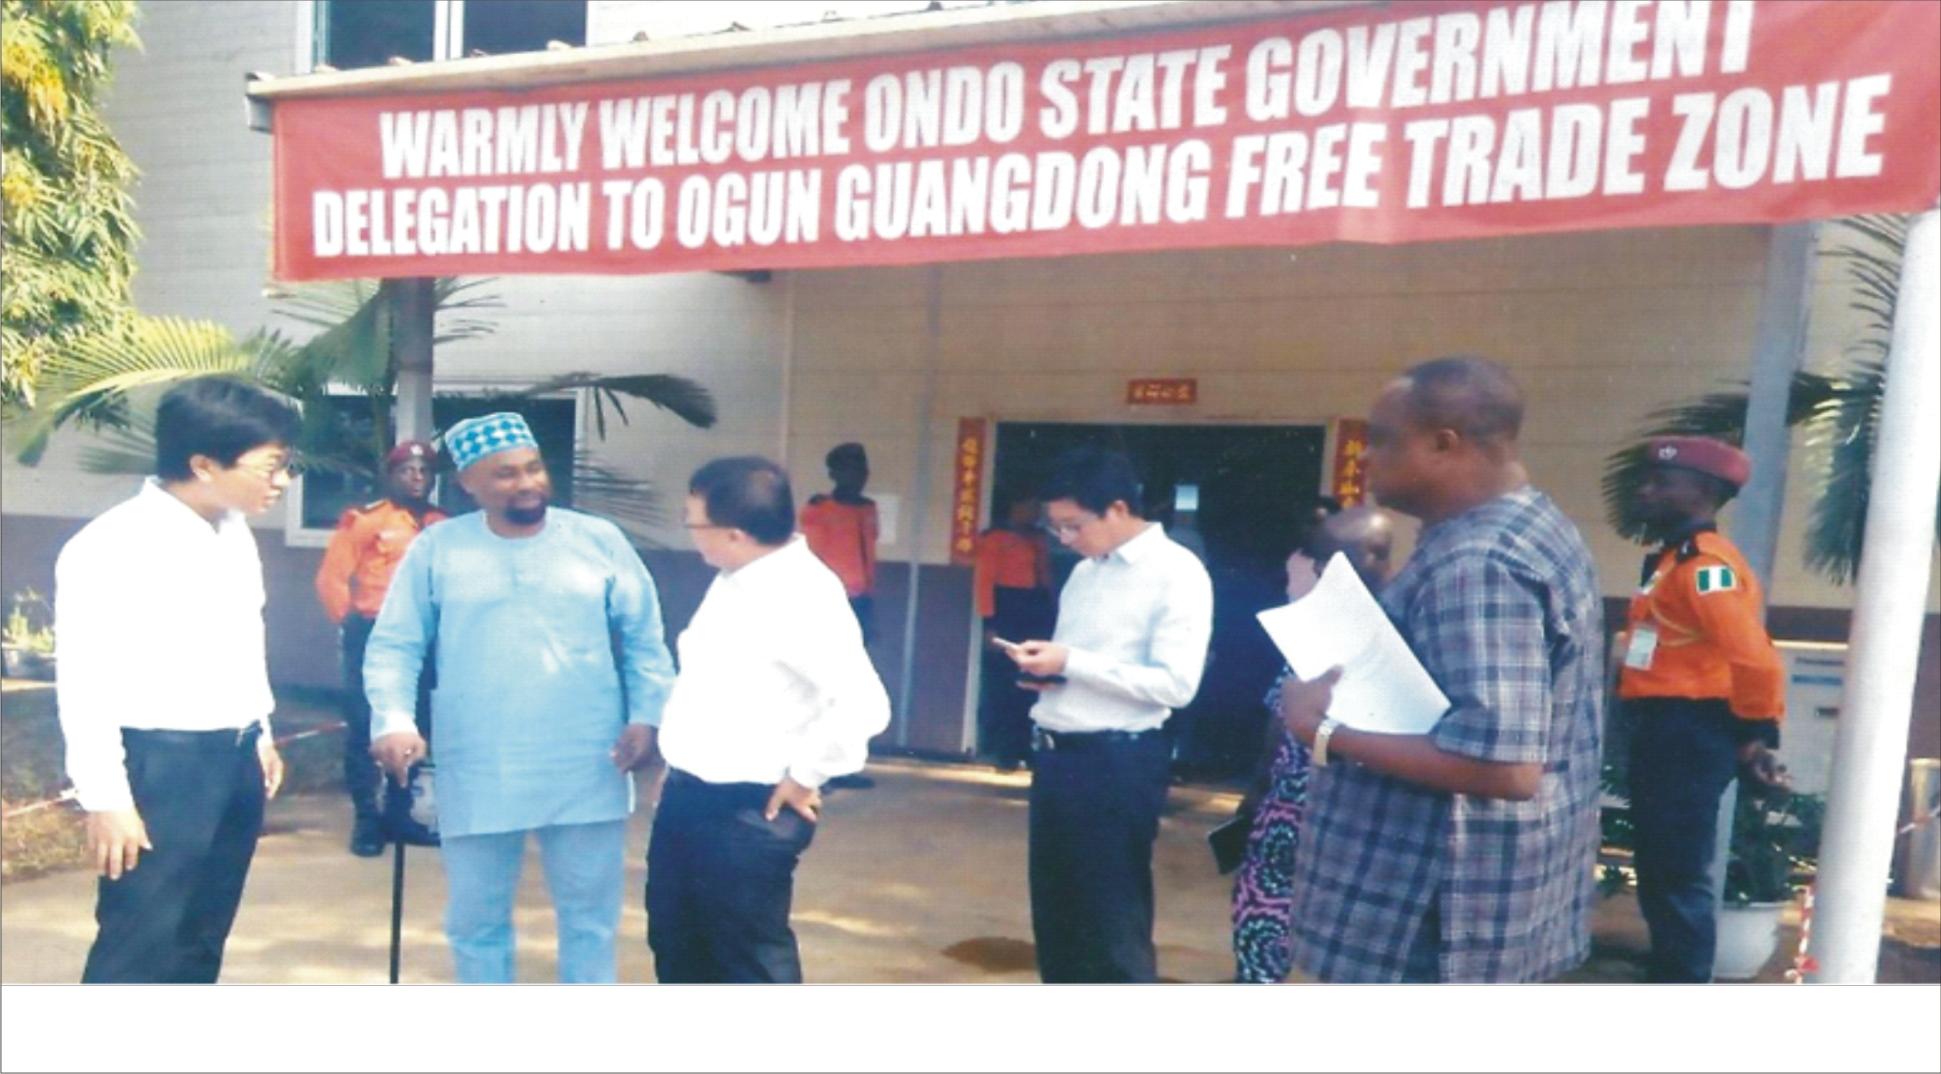 Ondo establishes GUANGDONG Free Trade Zone